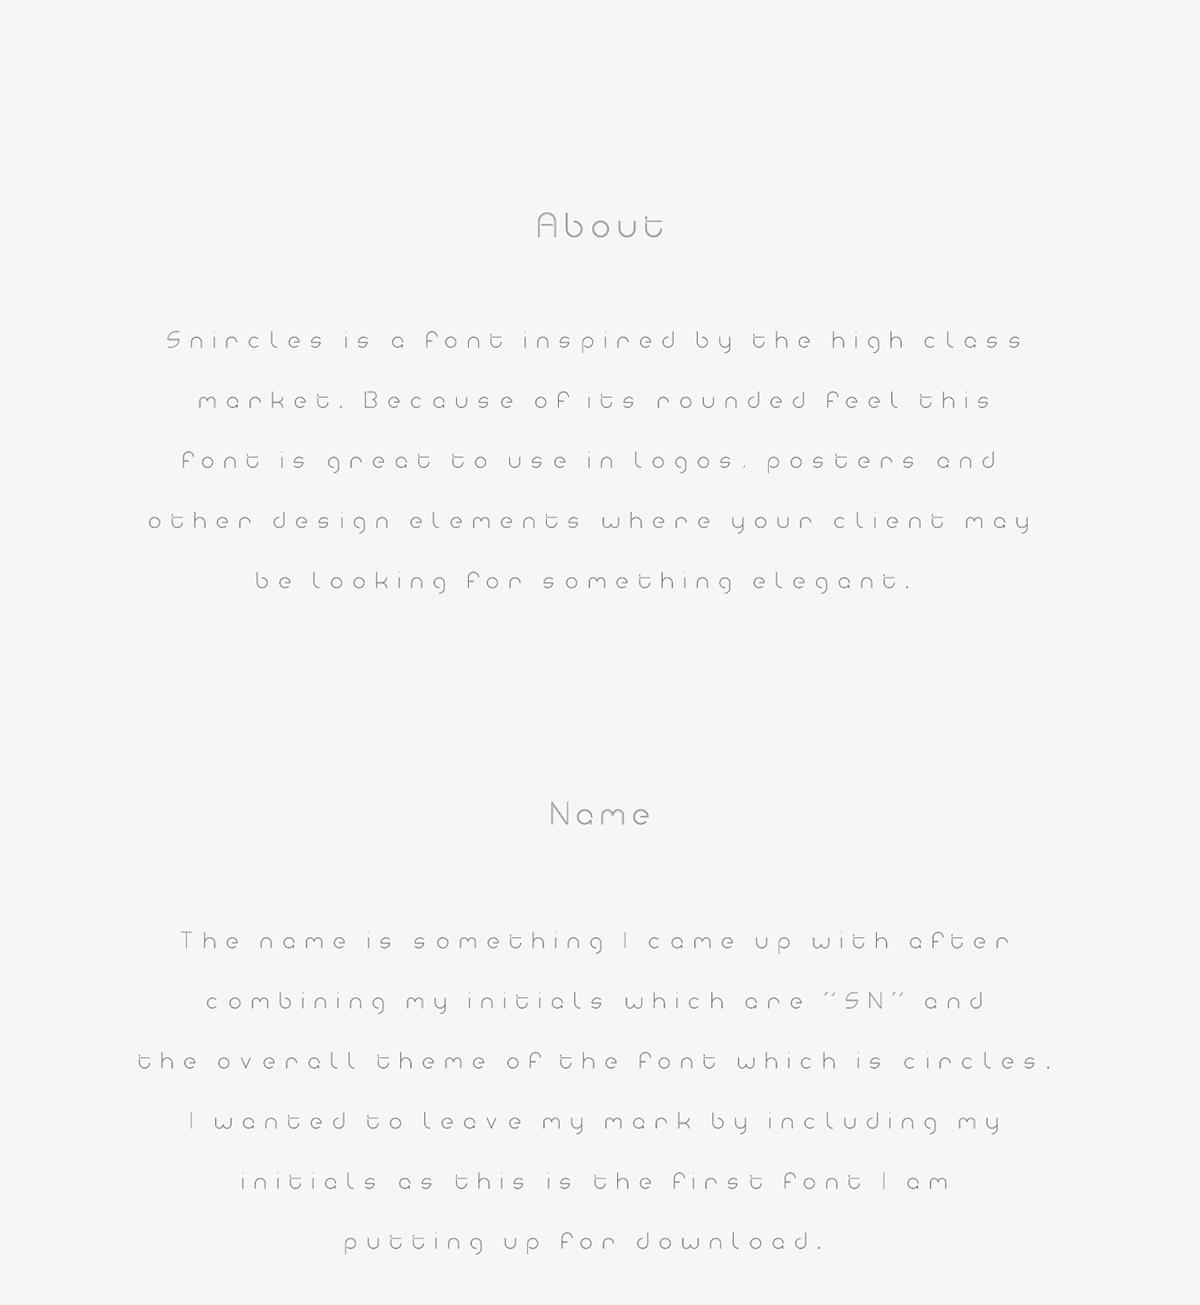 Snircles Font